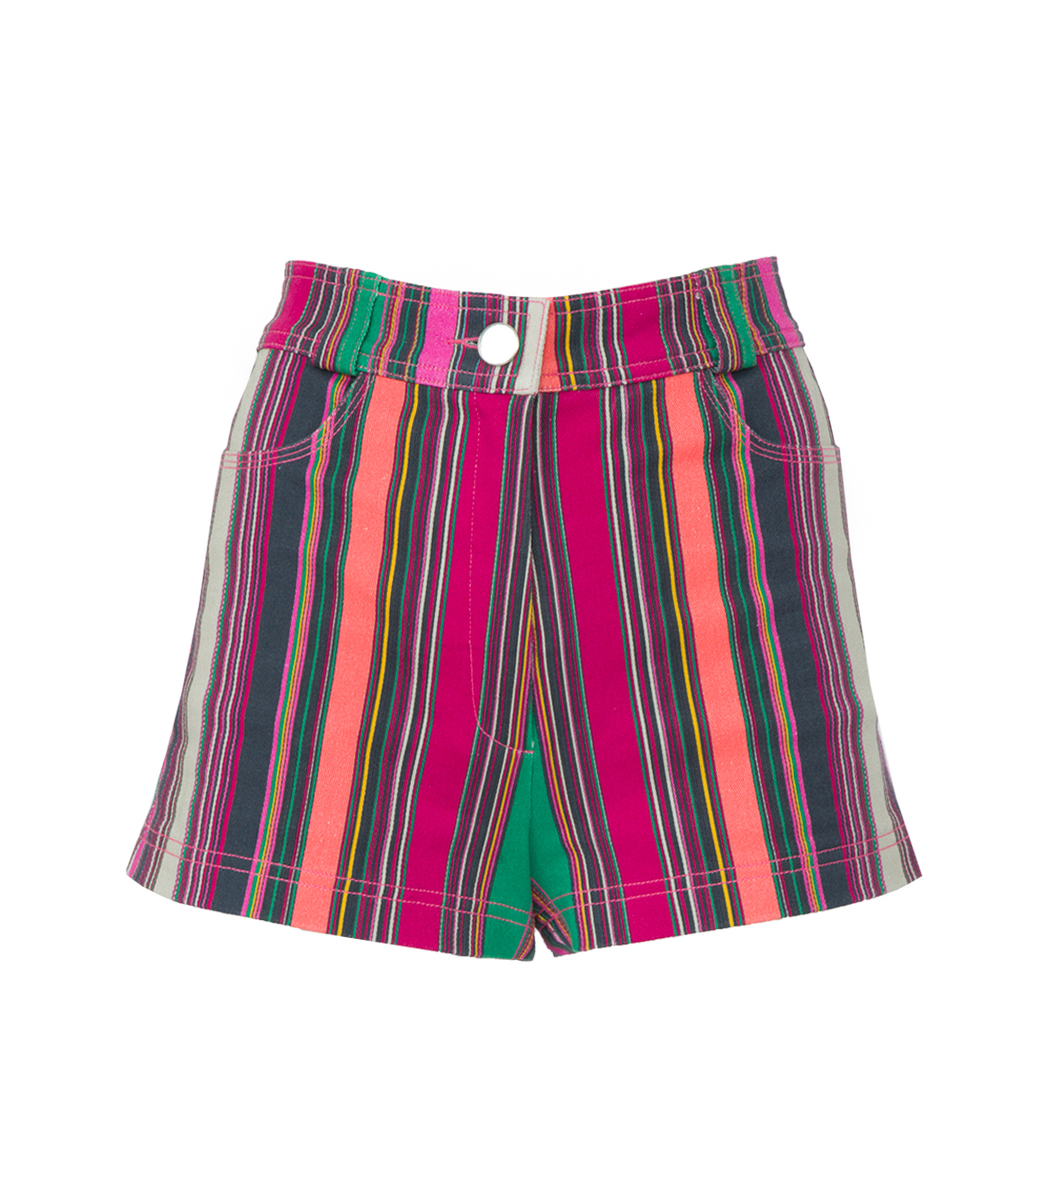 Lhd Multicolor Collins Avenue Striped Shorts